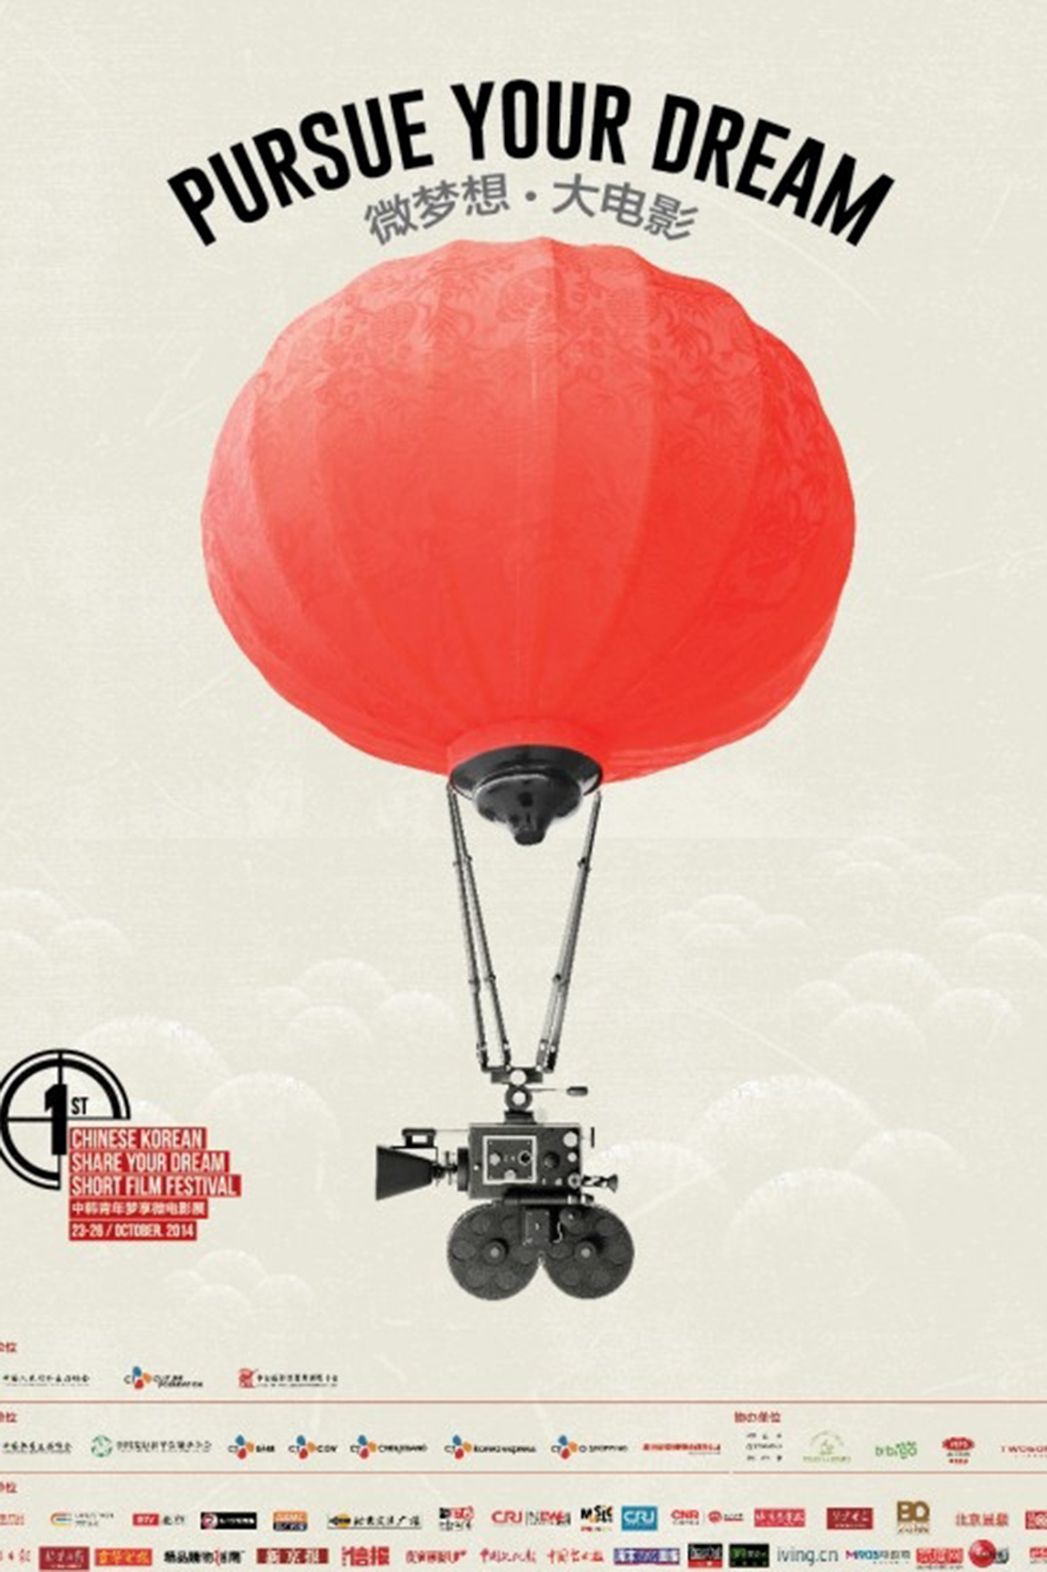 CJ Culture Foundation's Pursue Your Dream Competition in China - P 2014